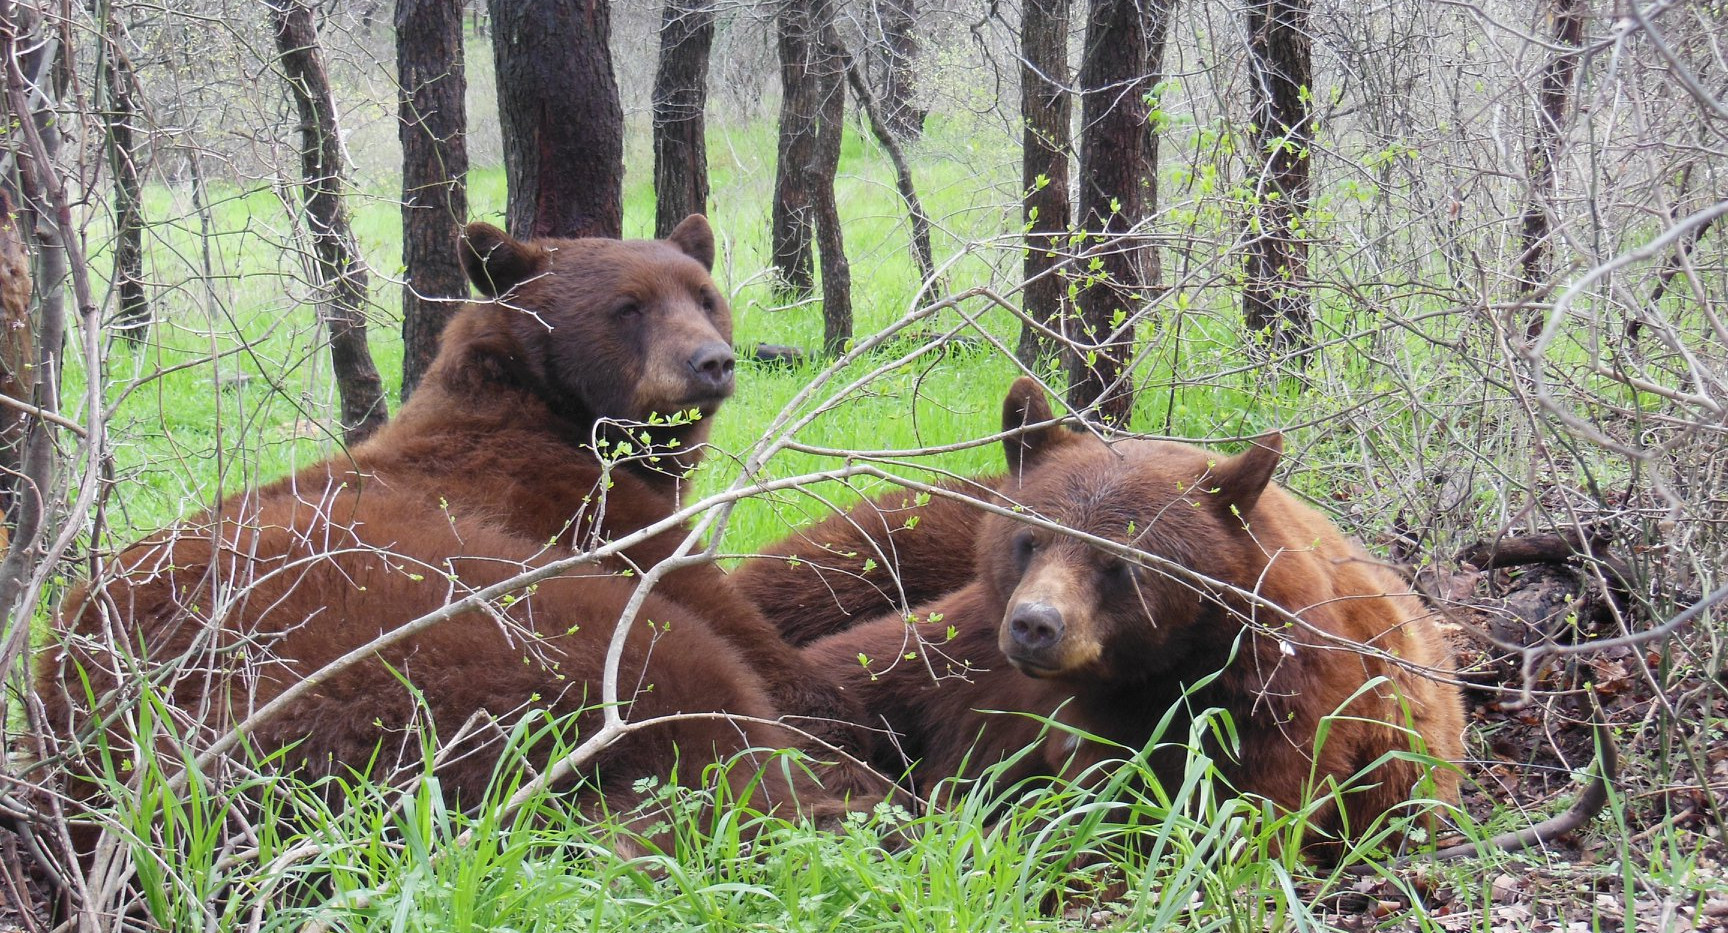 Rescued Bears